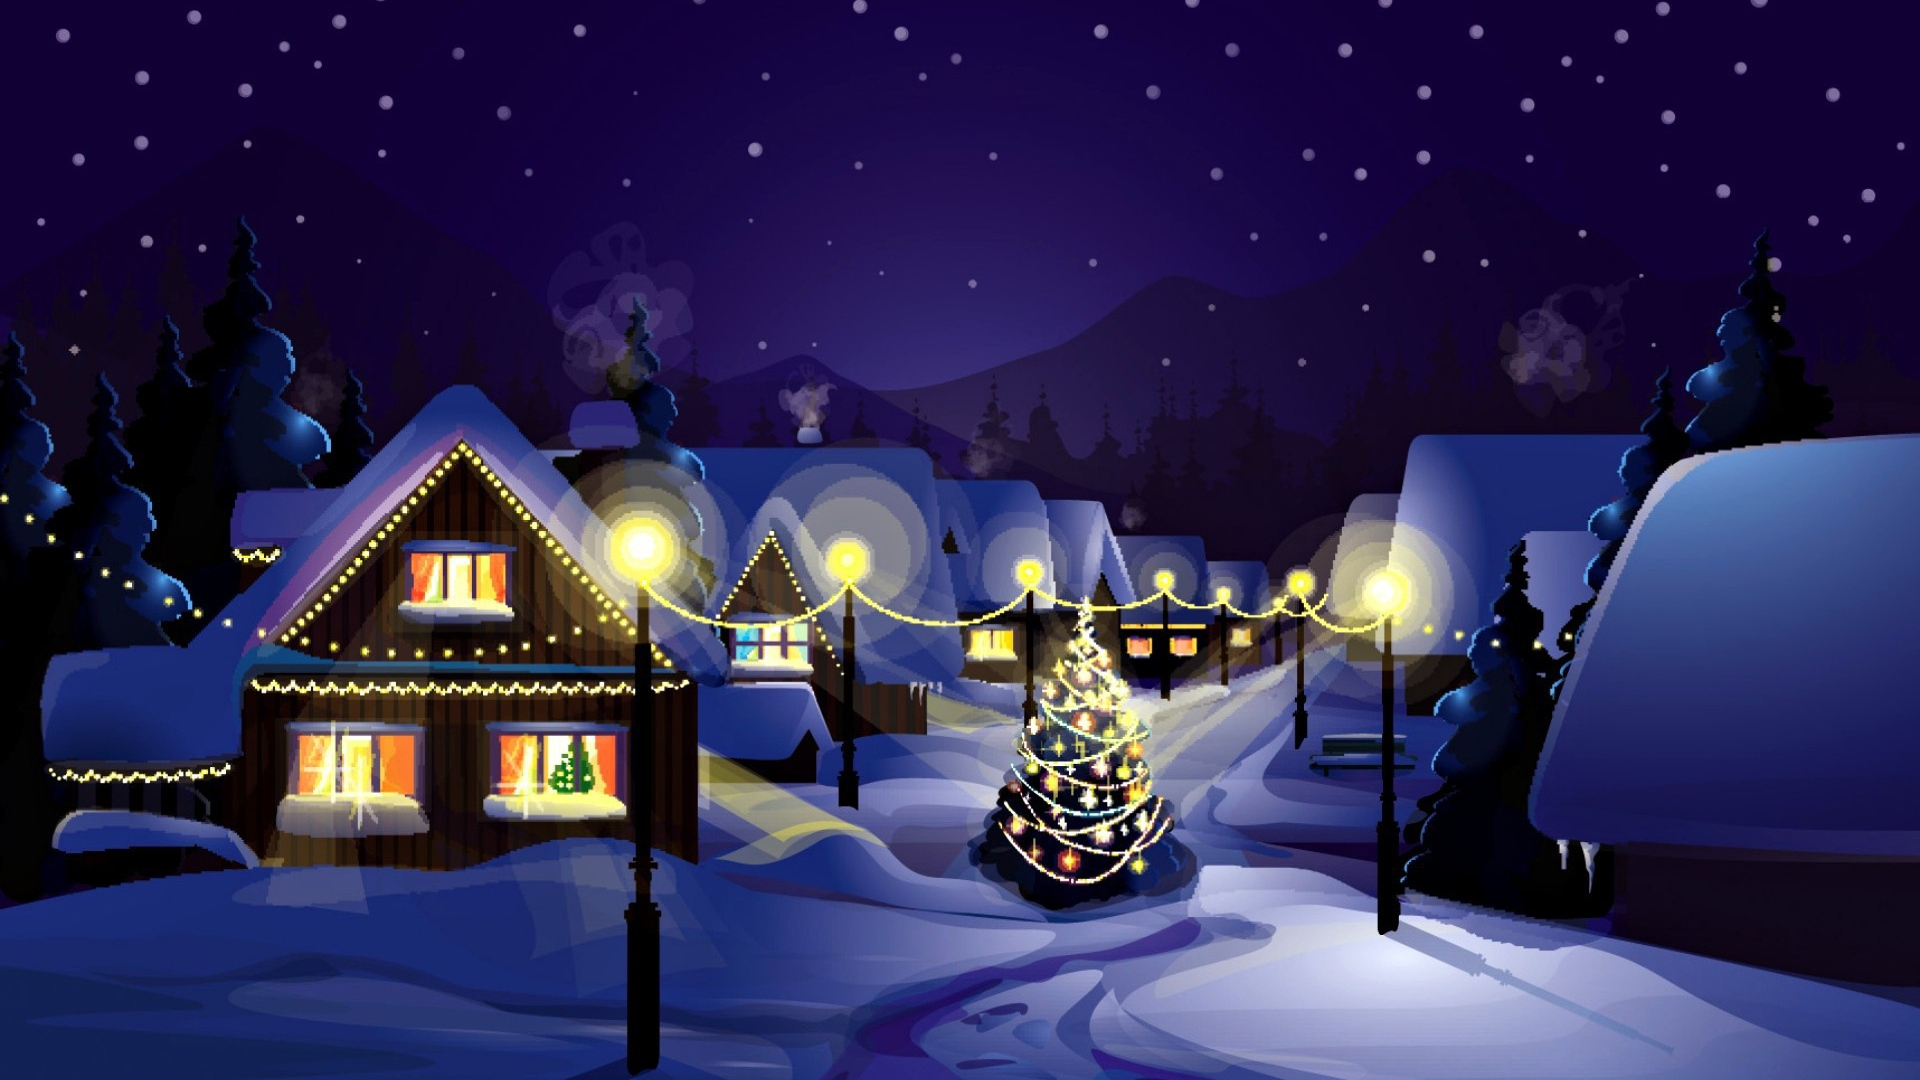 as desktop background desktop wallpapers holidays christmas wallpapers 1920x1080